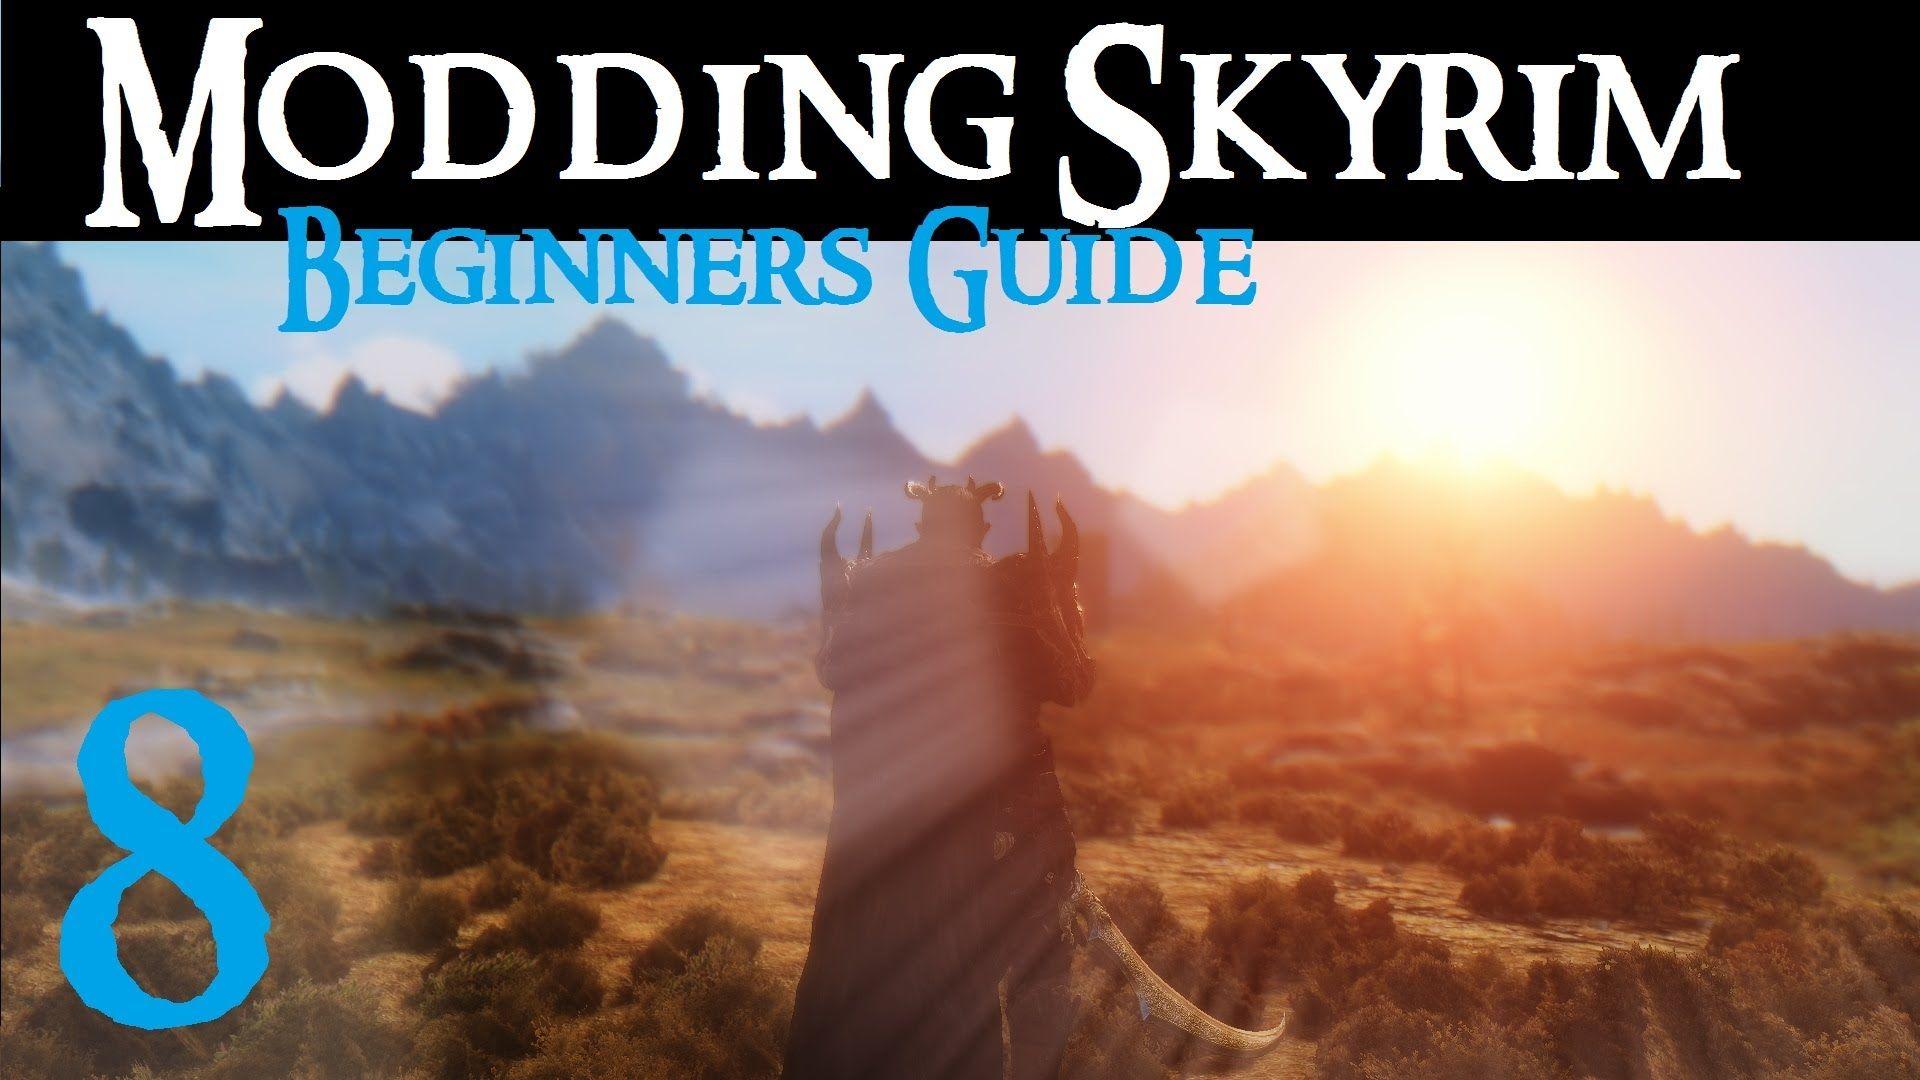 Beginner's Guide to Modding Skyrim - Part 8 : Immersion